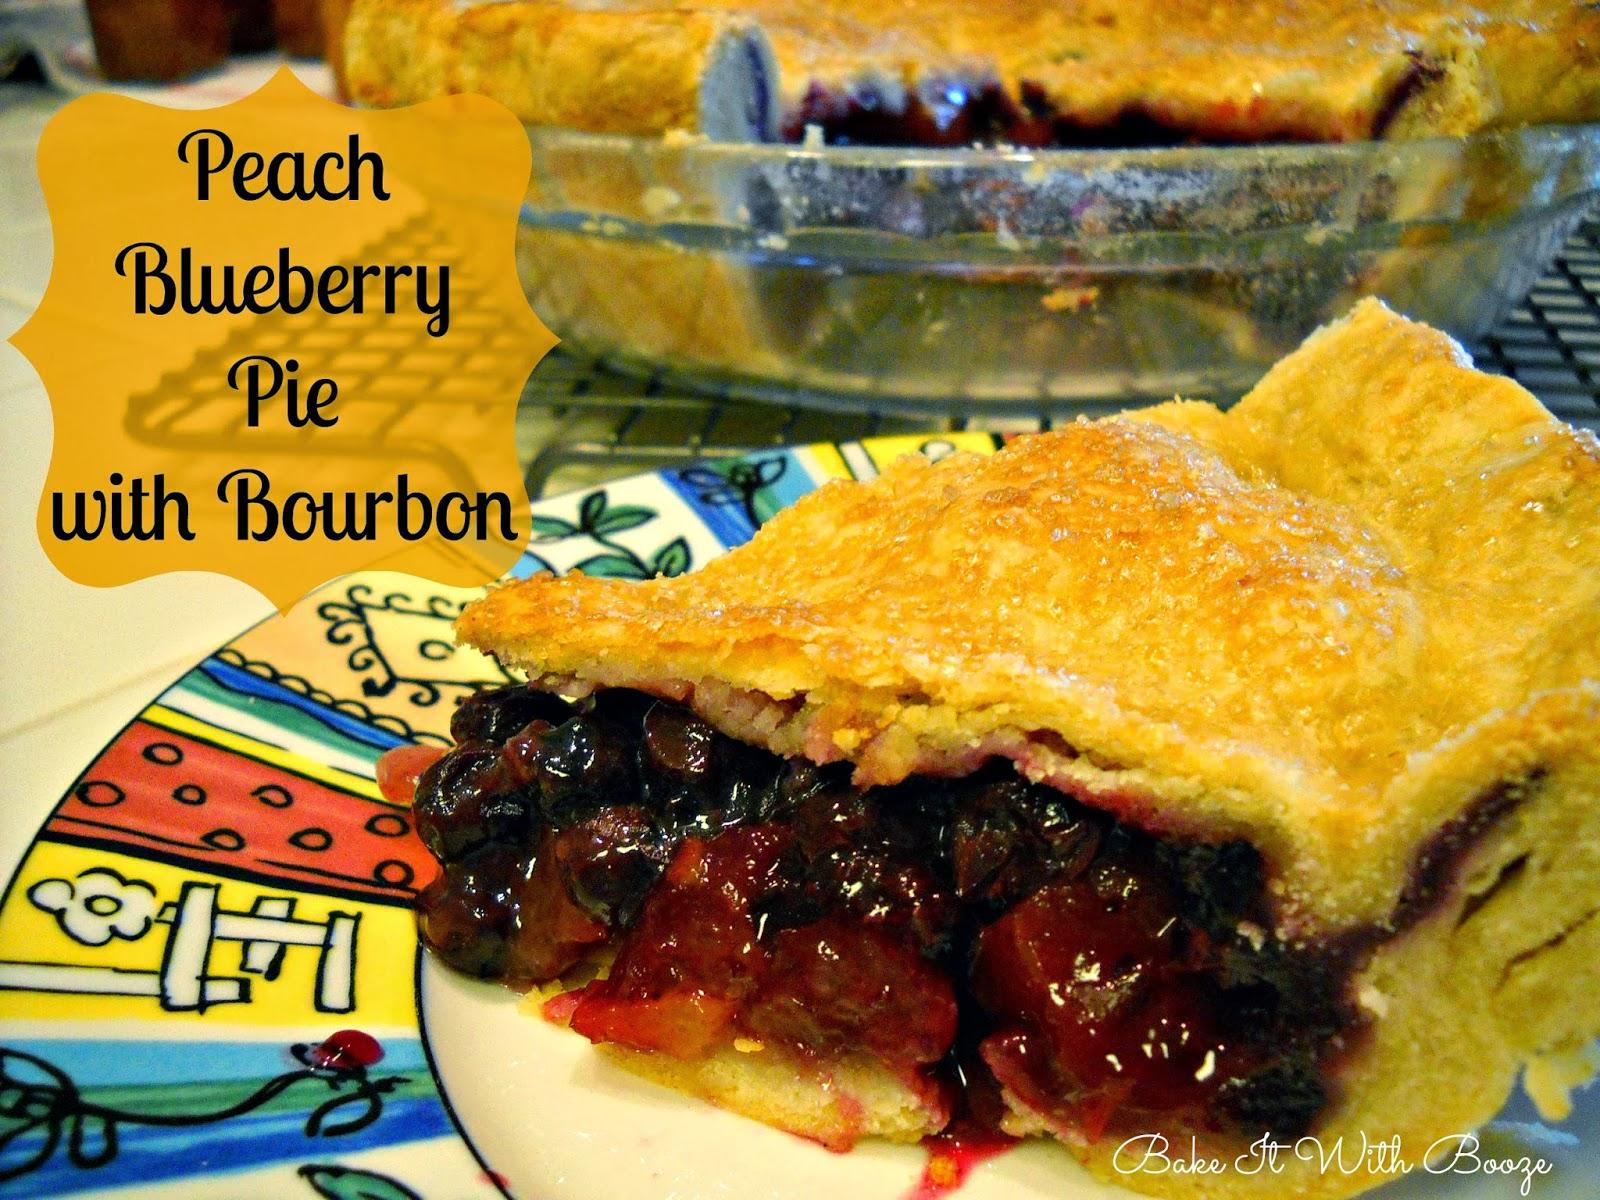 Peach Blueberry Pie with Bourbon